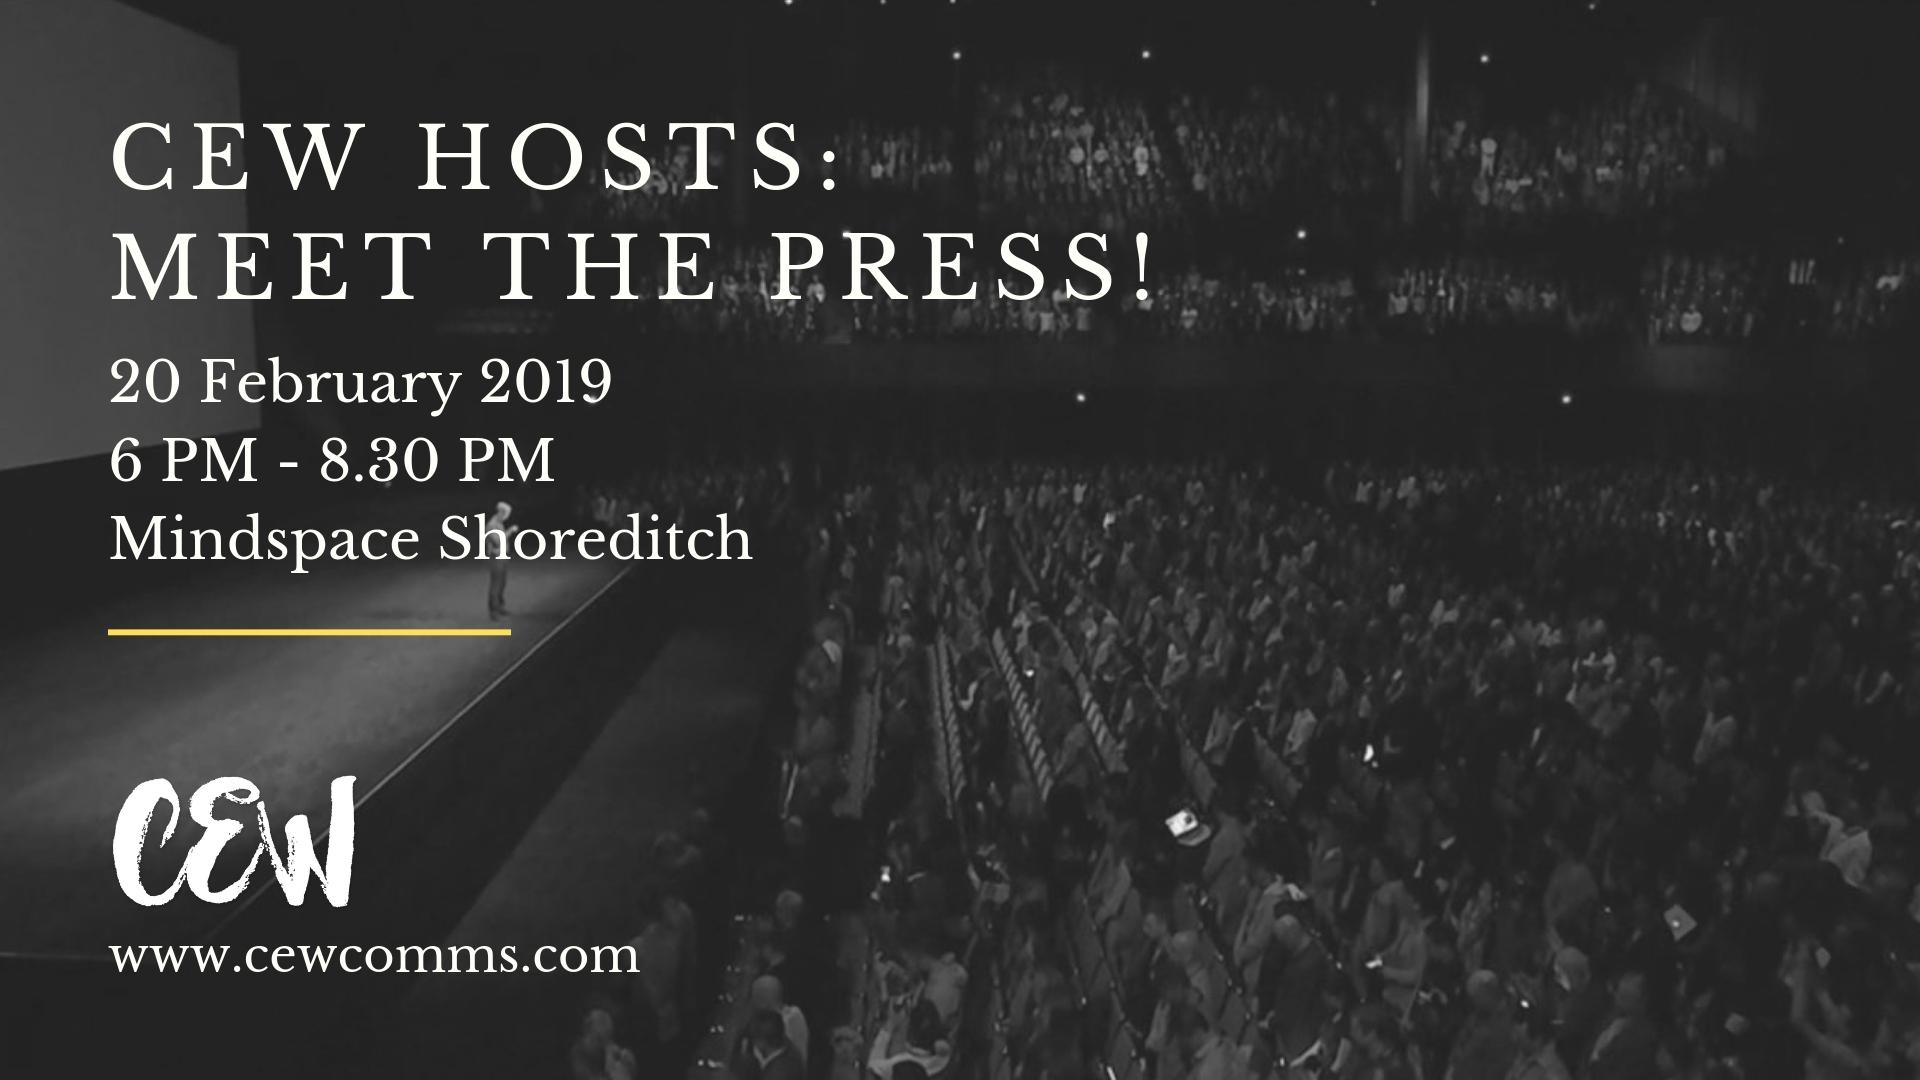 Meet The Press - Feb 2019 (Eventbrite banner).jpg